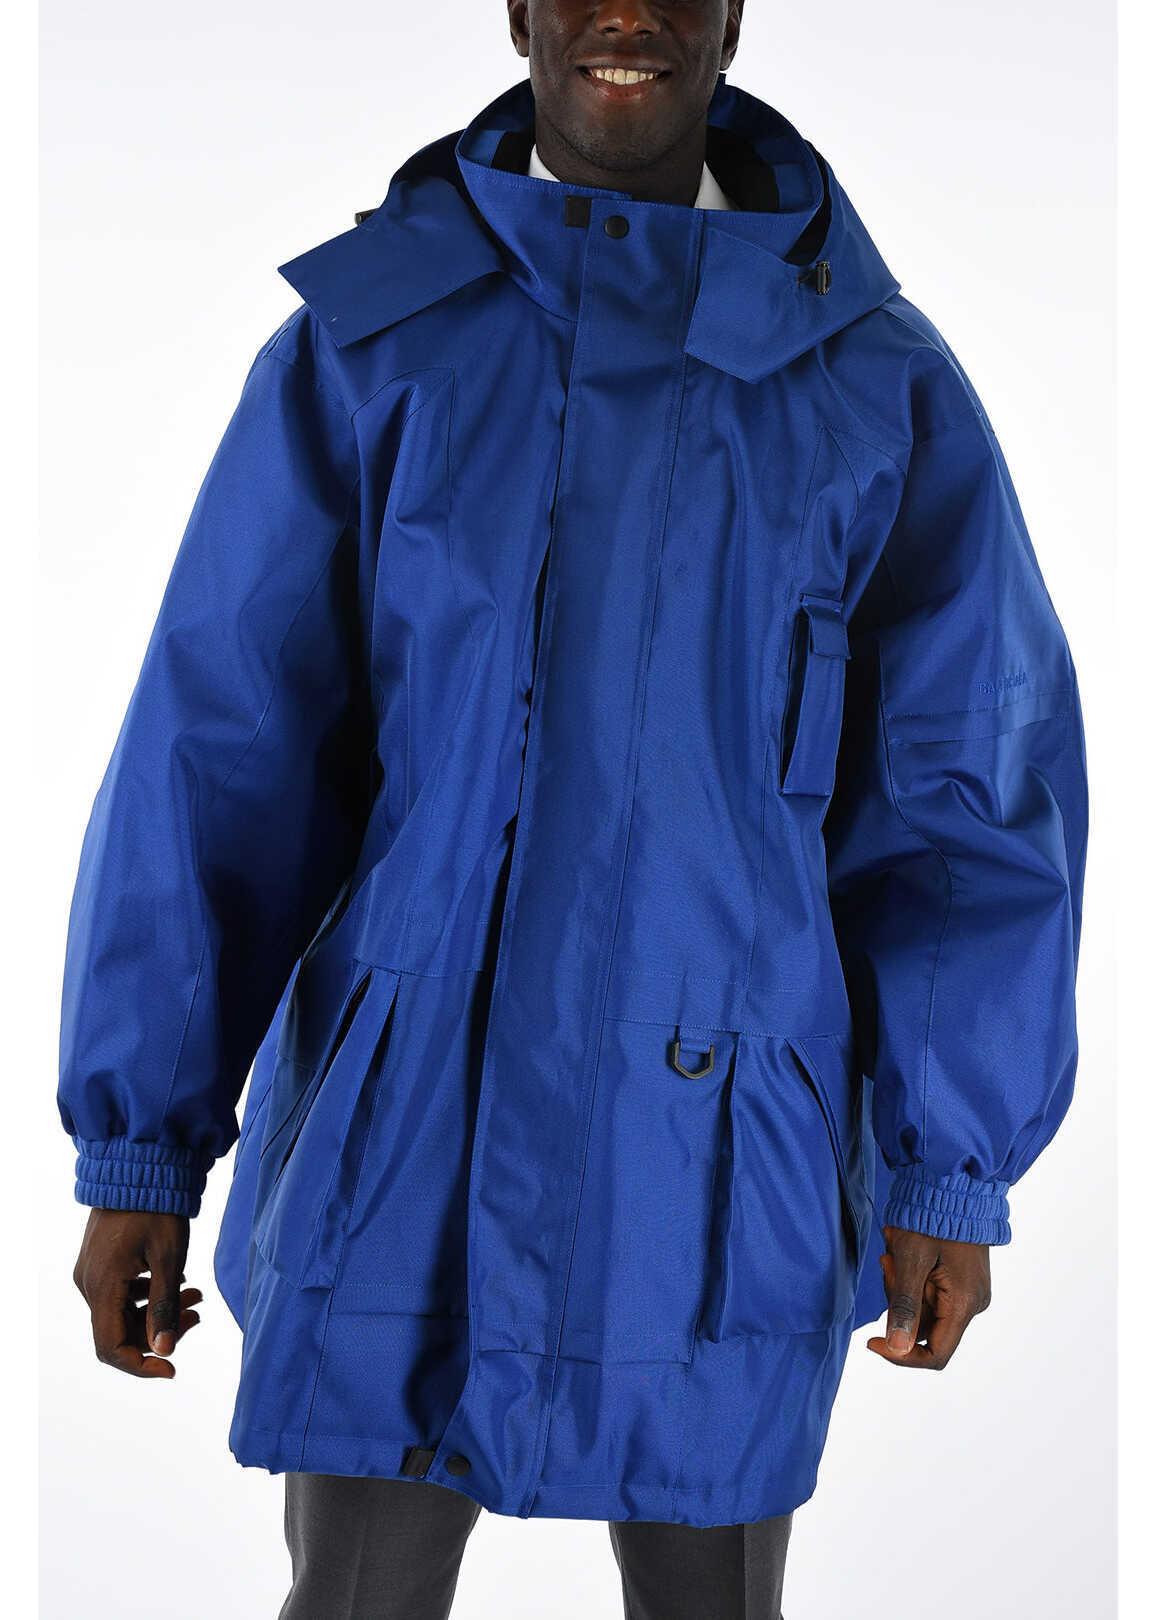 Nylon Hooded Windbreaker Jacket